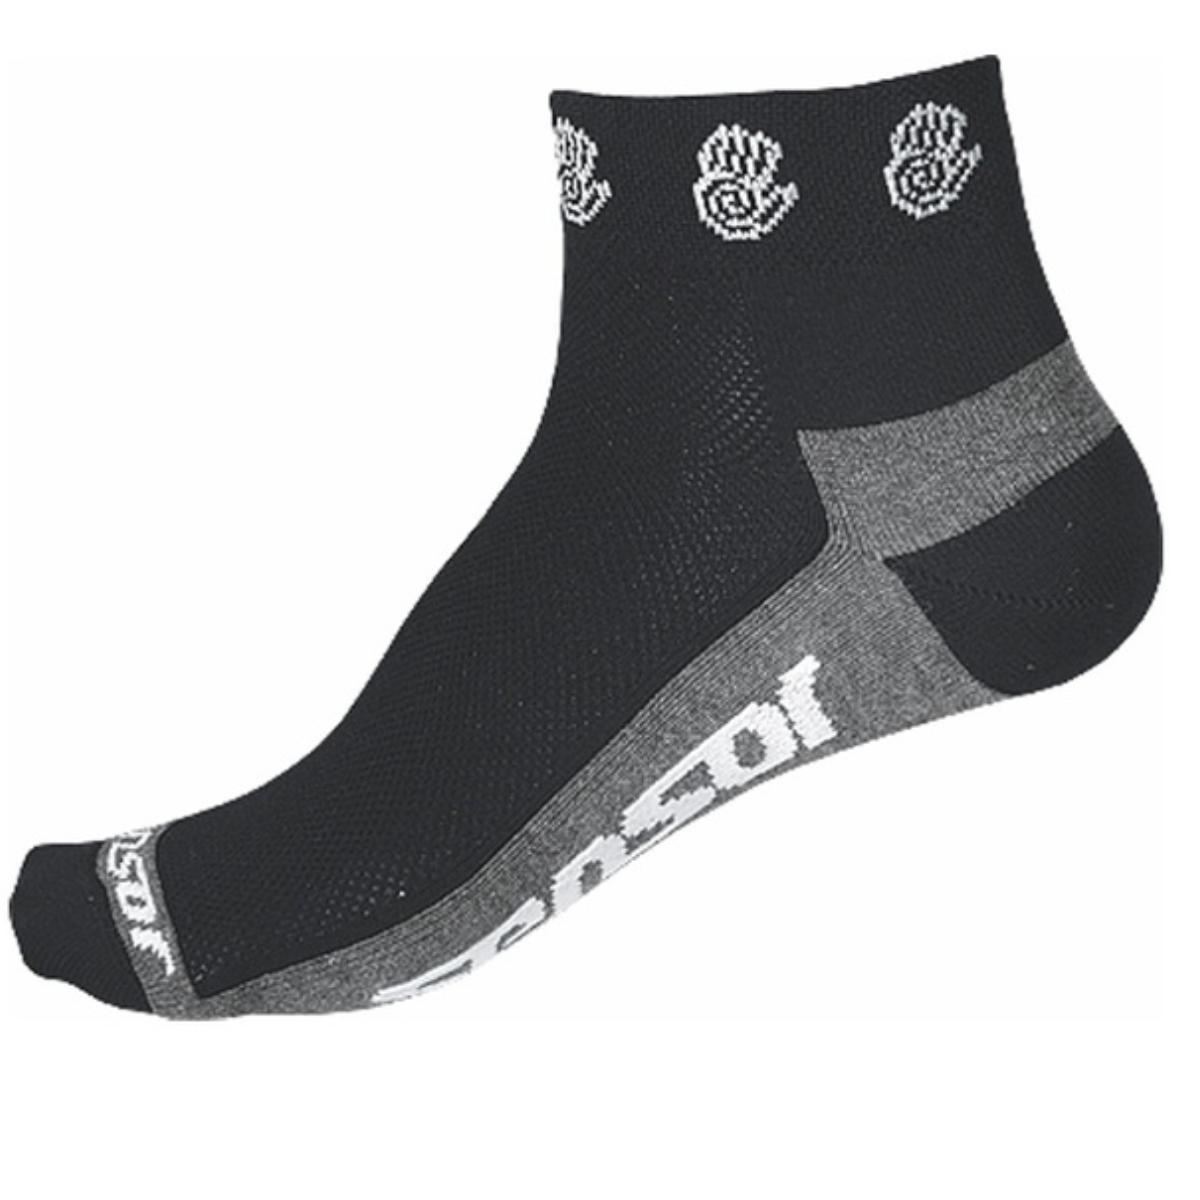 Ponožky SENSOR Race Lite Ručičky 9-11 černé